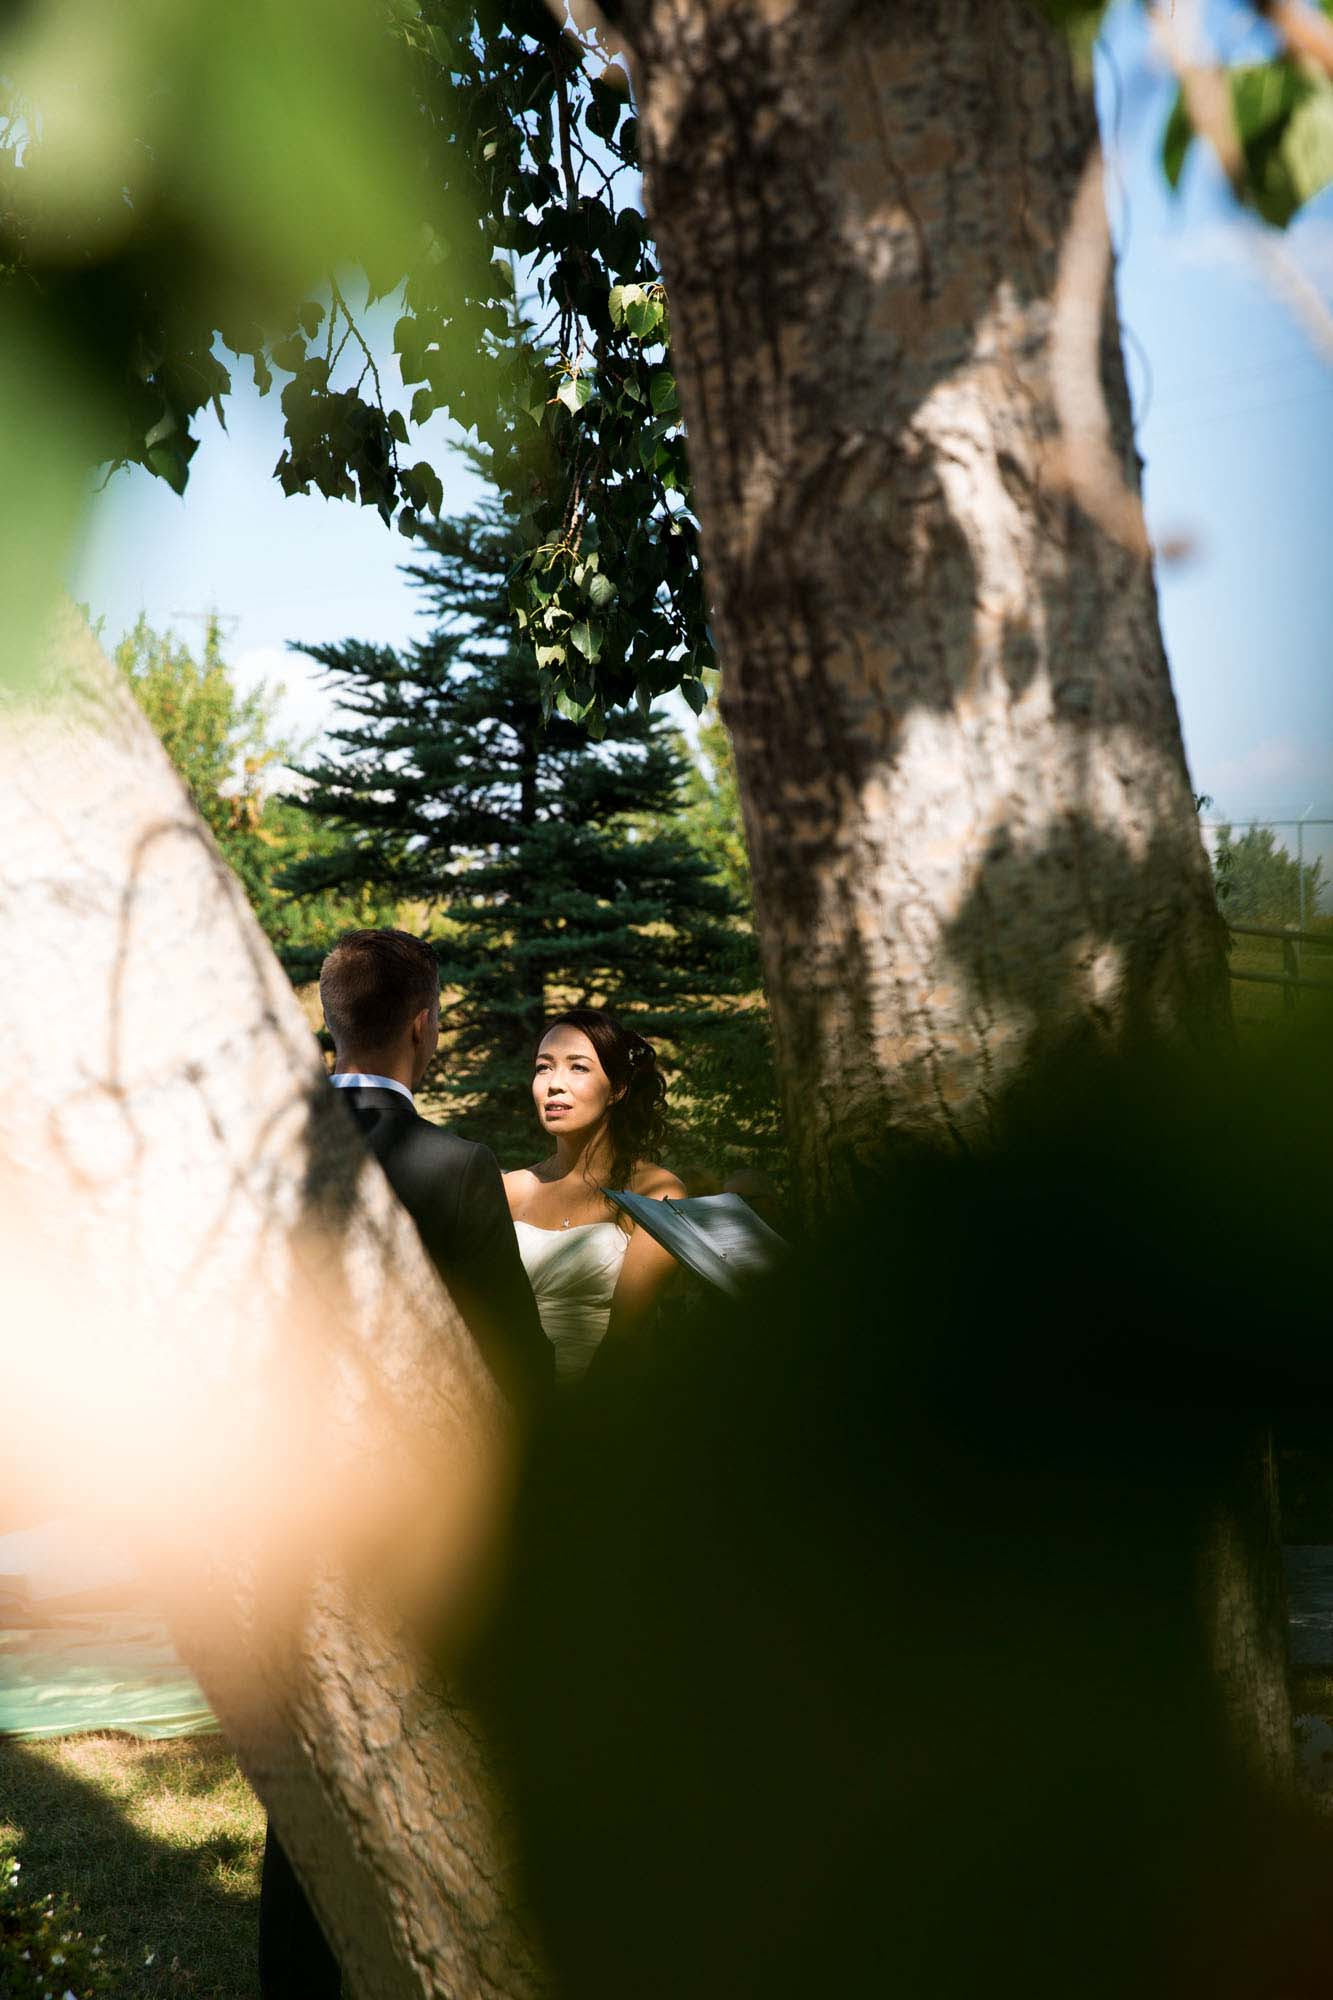 Calgary engagement and wedding photographer, micro wedding outdoors